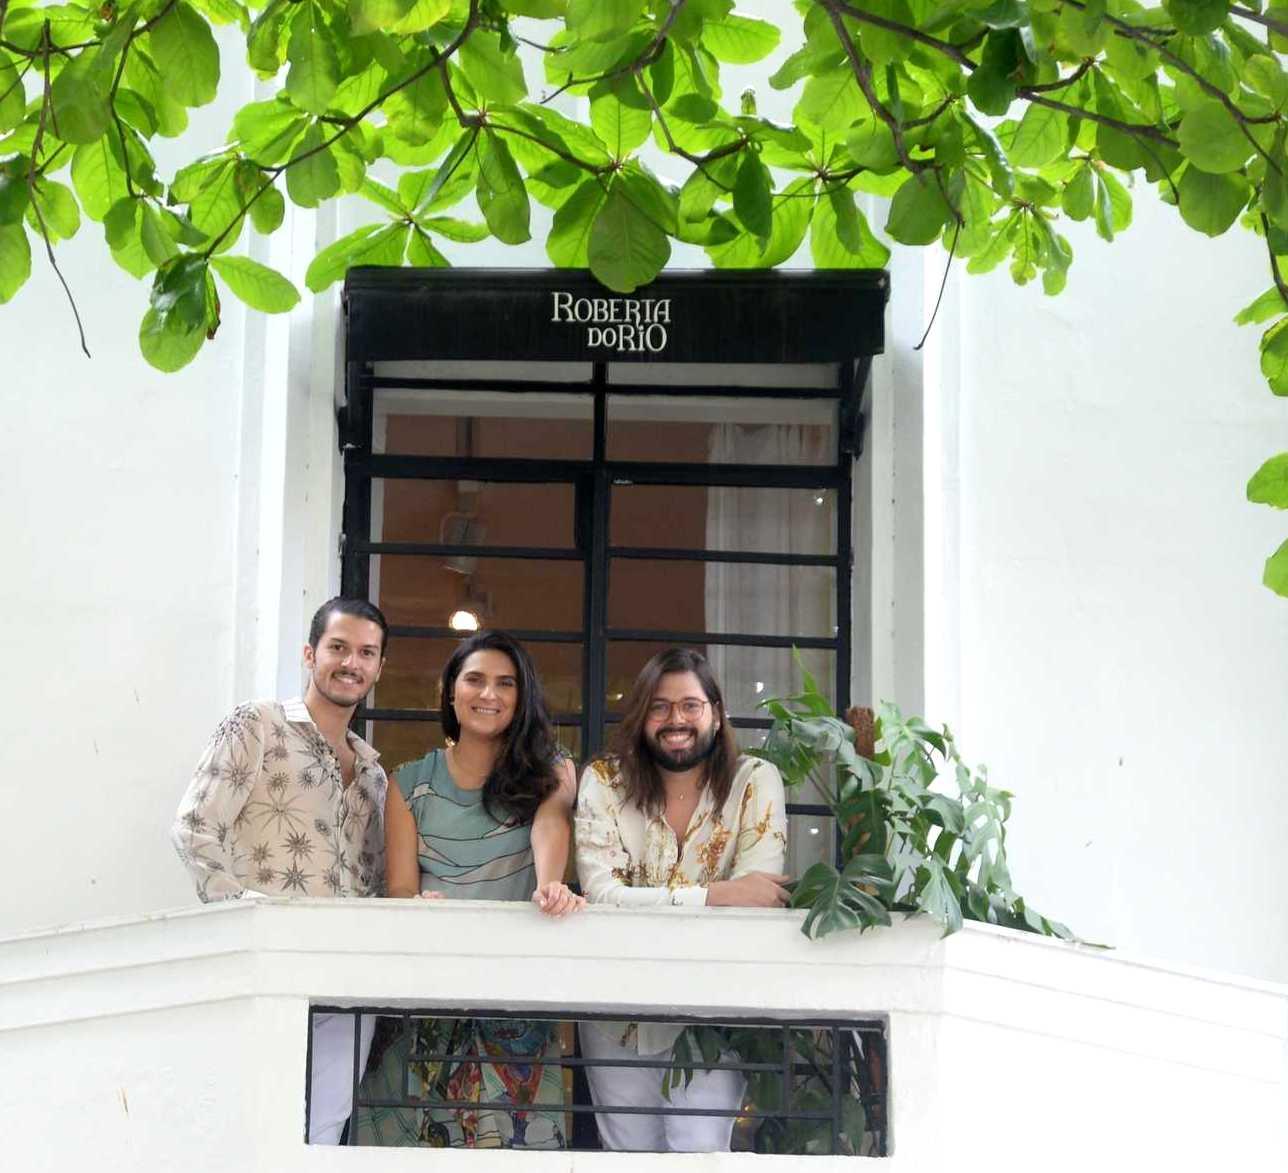 1_Patrick Doering, Roberta do Rio e Thomaz Azulay